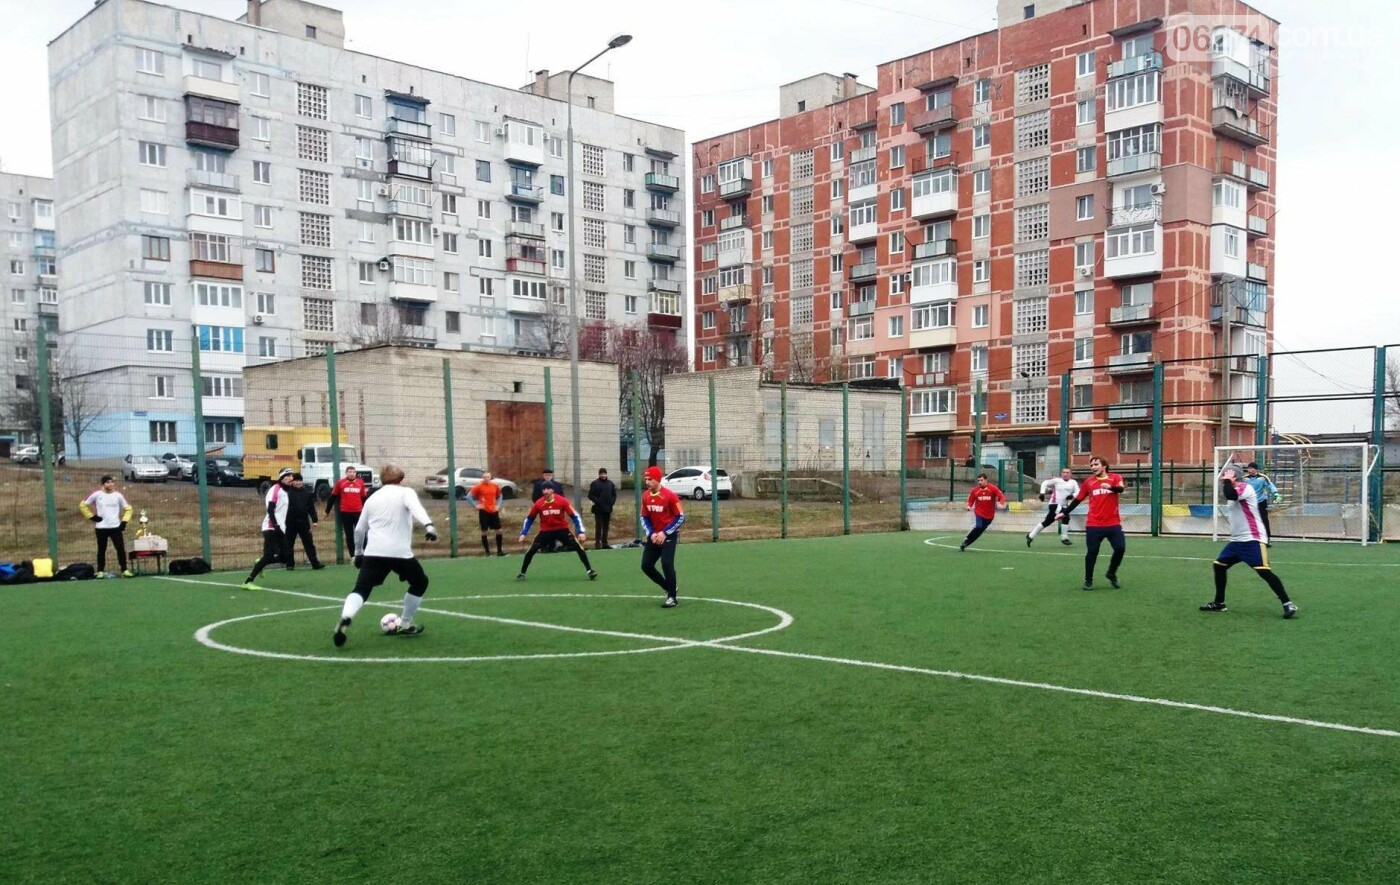 Кубок мэра по футболу из Бахмута отправился в Троицкое, фото-1